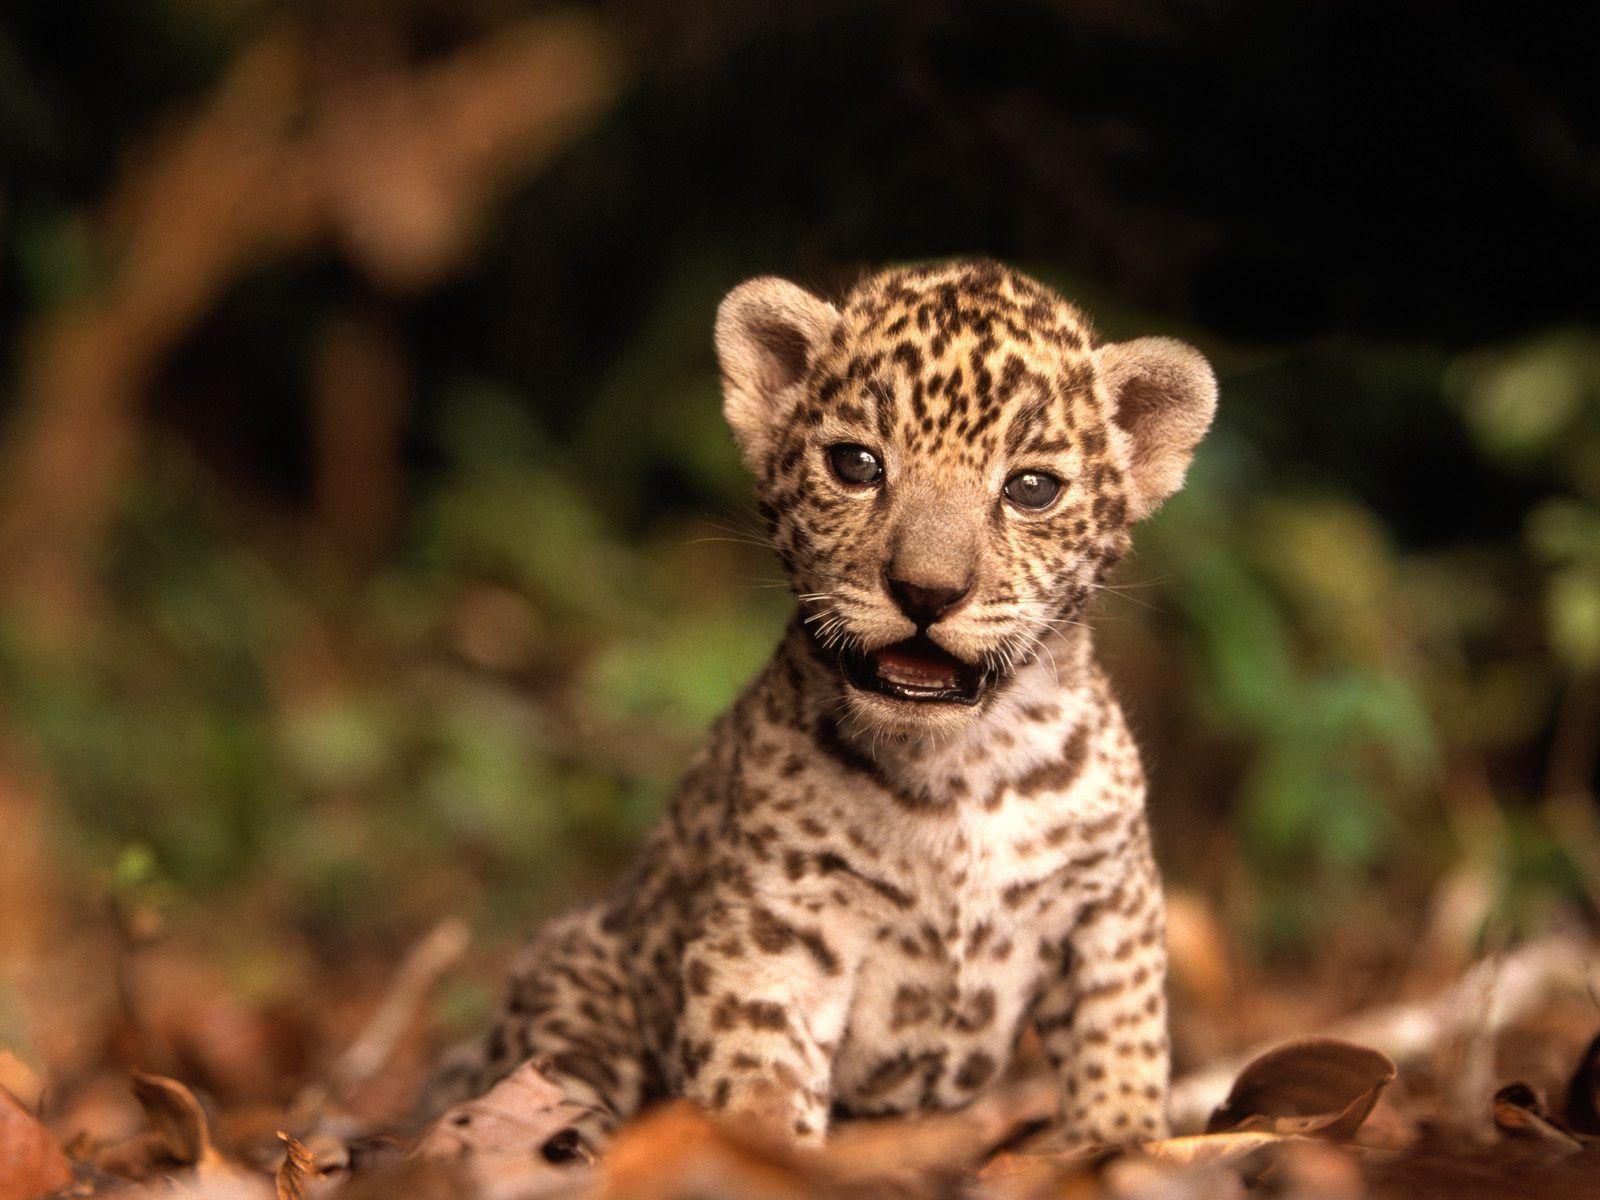 Baby Cheetah Wallpaper Baby Wild Animals Cute Baby Animals Jaguar Animal